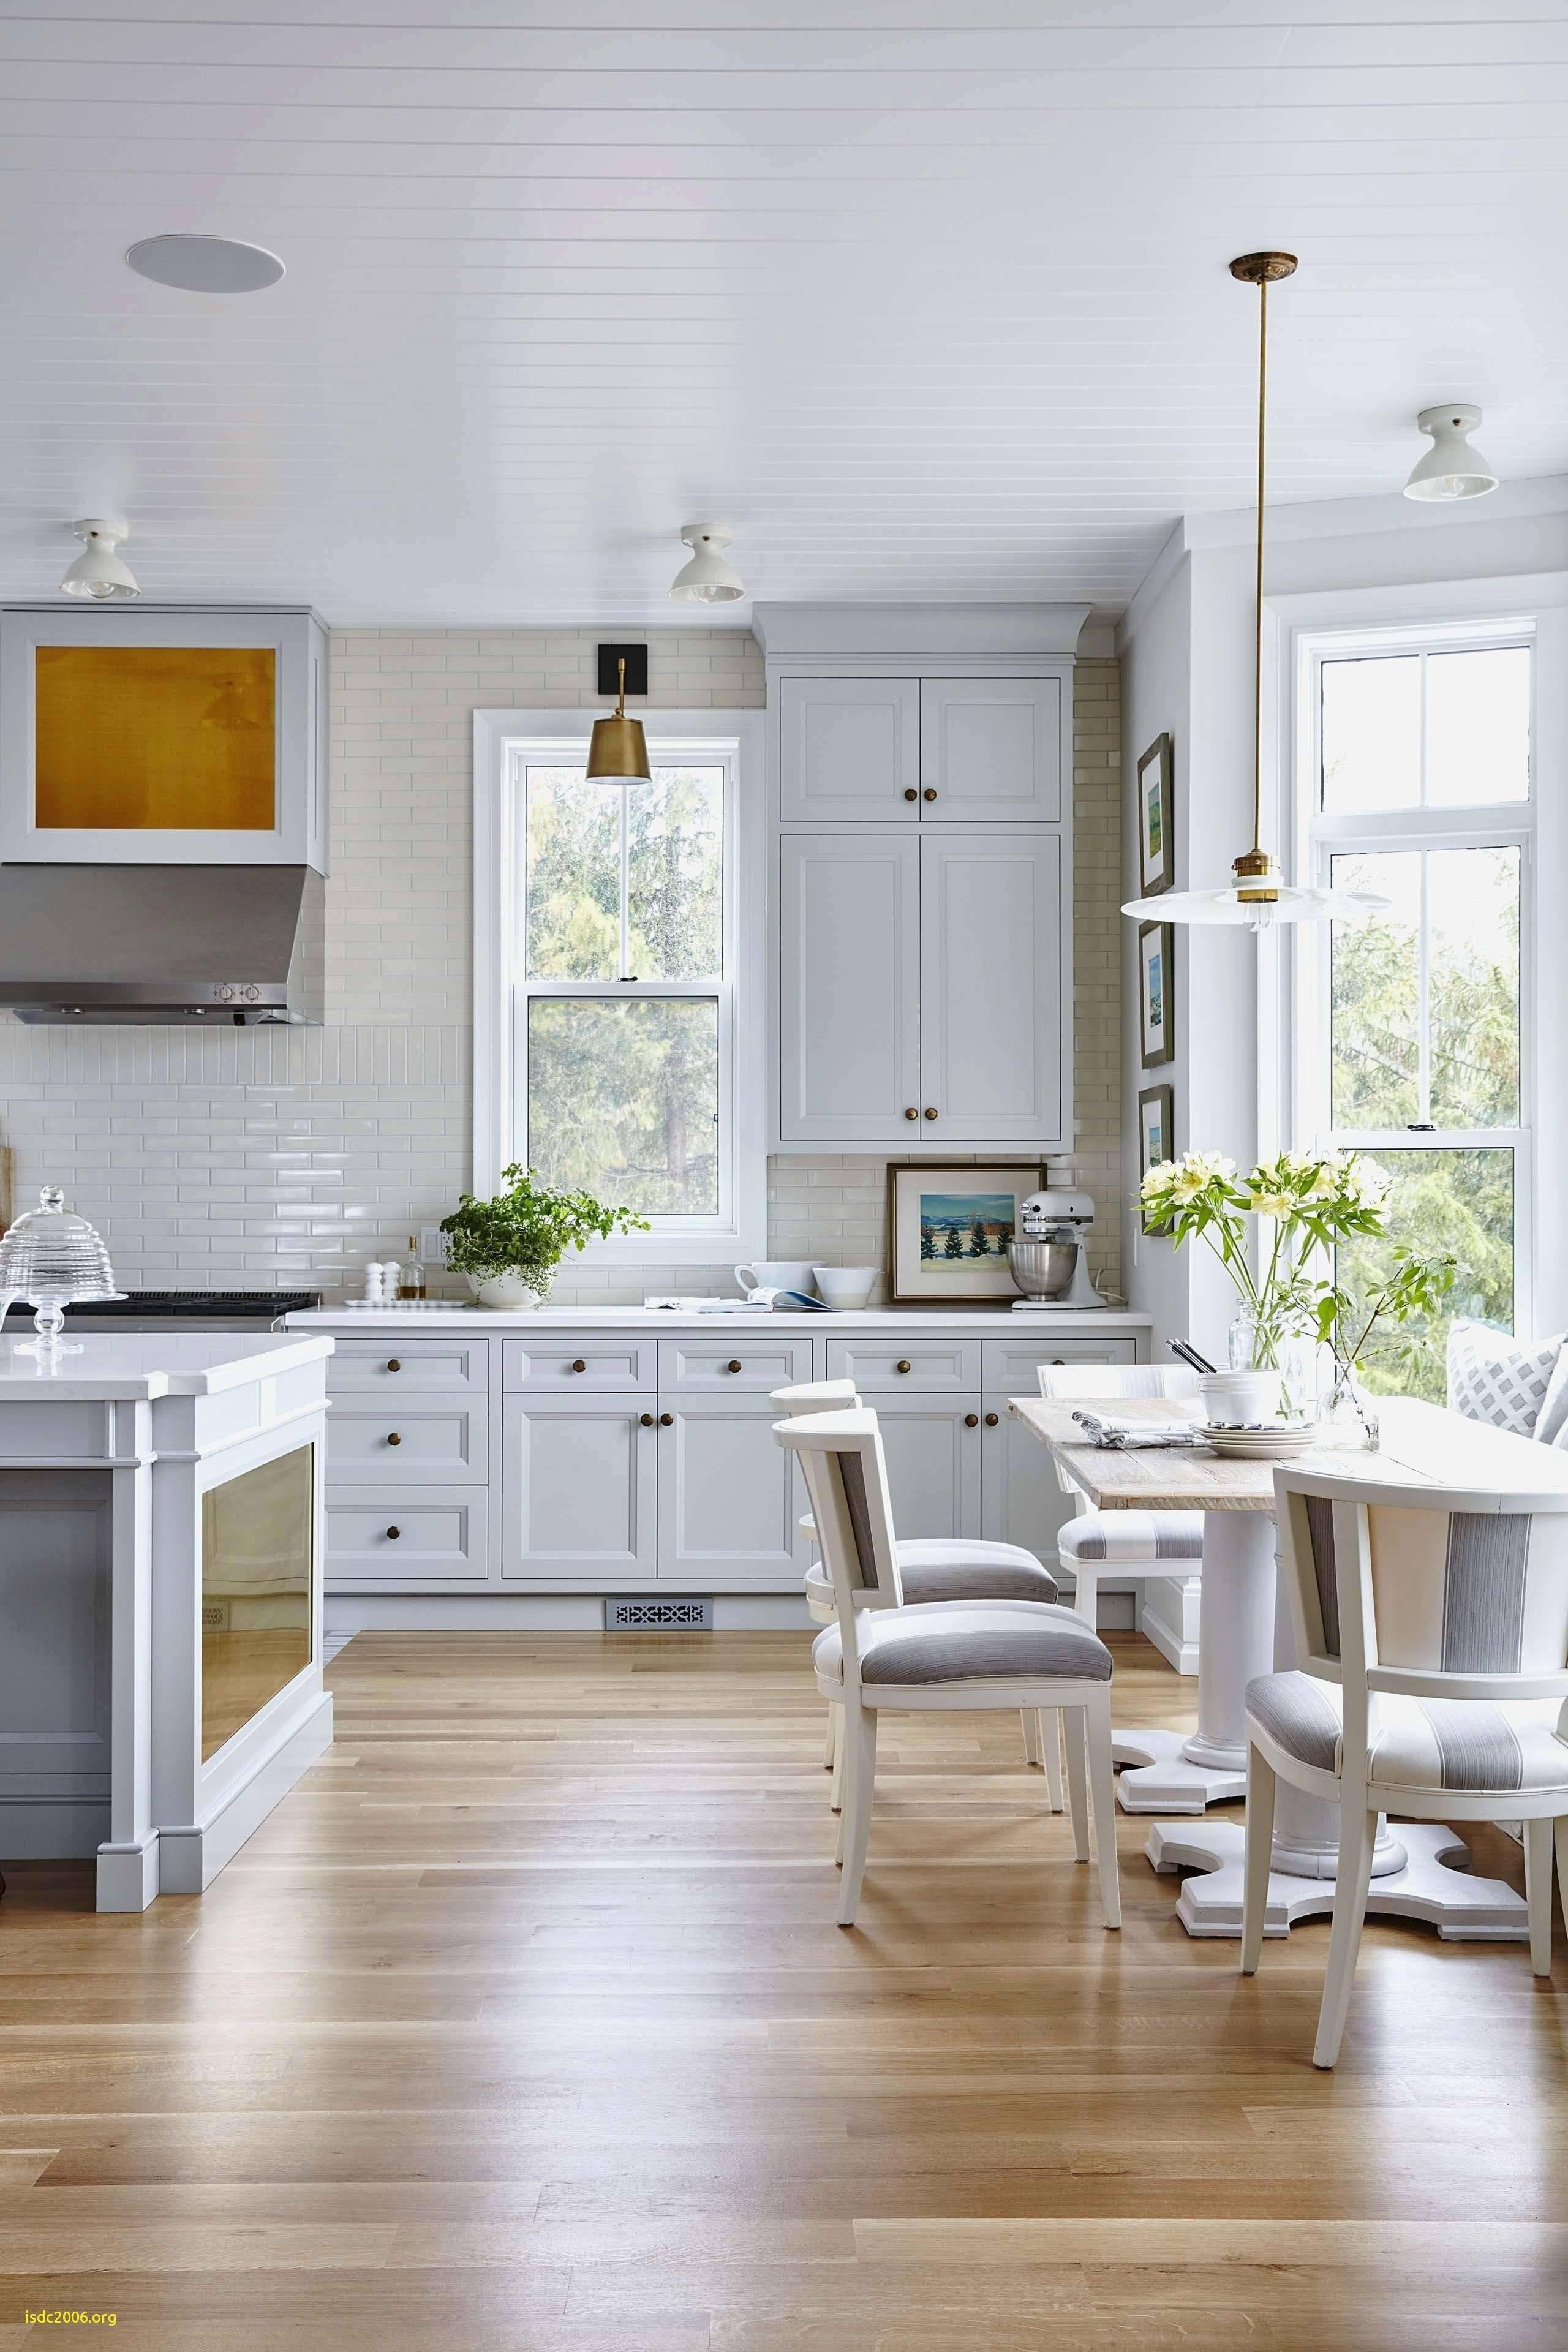 grey hardwood floors living room of best of grey living rooms home design minimalist in gray bedroom decor elegant kitchen joys kitchen joys kitchen 0d kitchens design ideas design